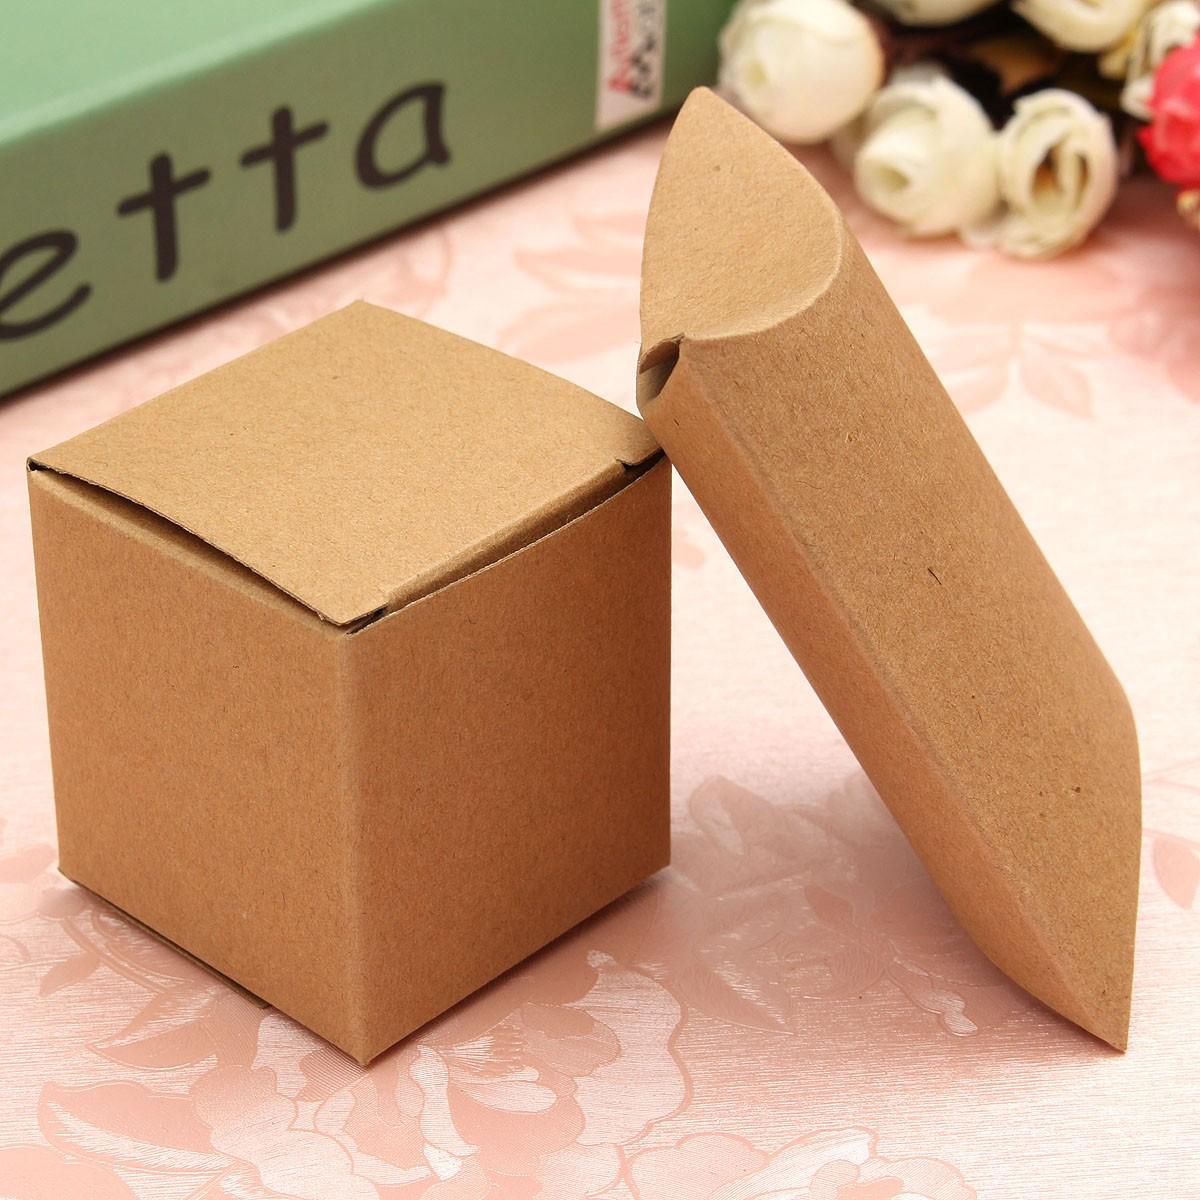 Wedding Gift Boxes Singapore : ... 12 Brown Card Gift Pillow Box Boxes Wedding FavourWholesale Party Box